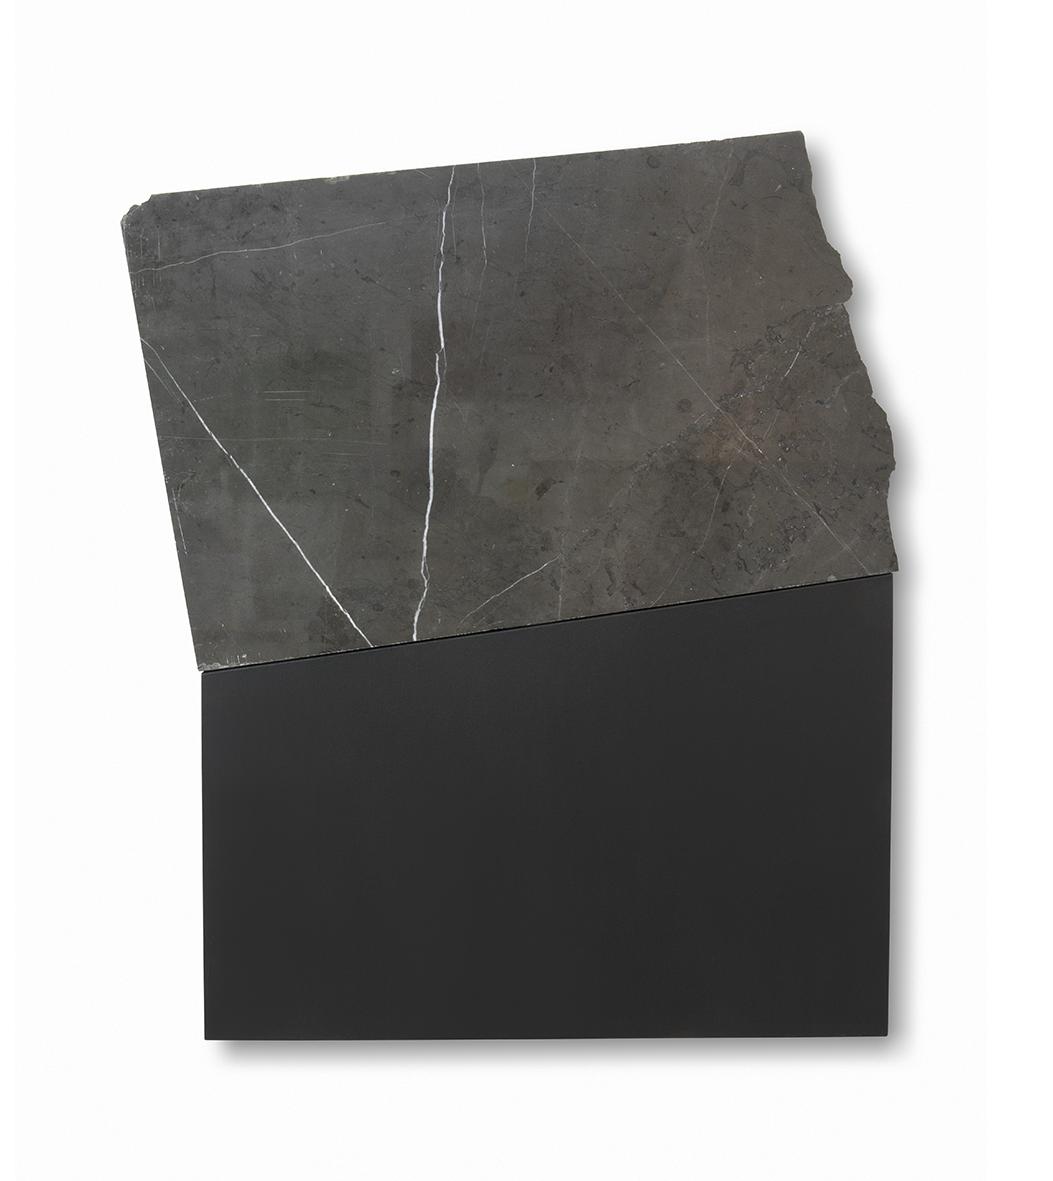 Fragmento grafito 2. 2019. Acrílico sobre lienzo y mármol. 89 x 70 cm